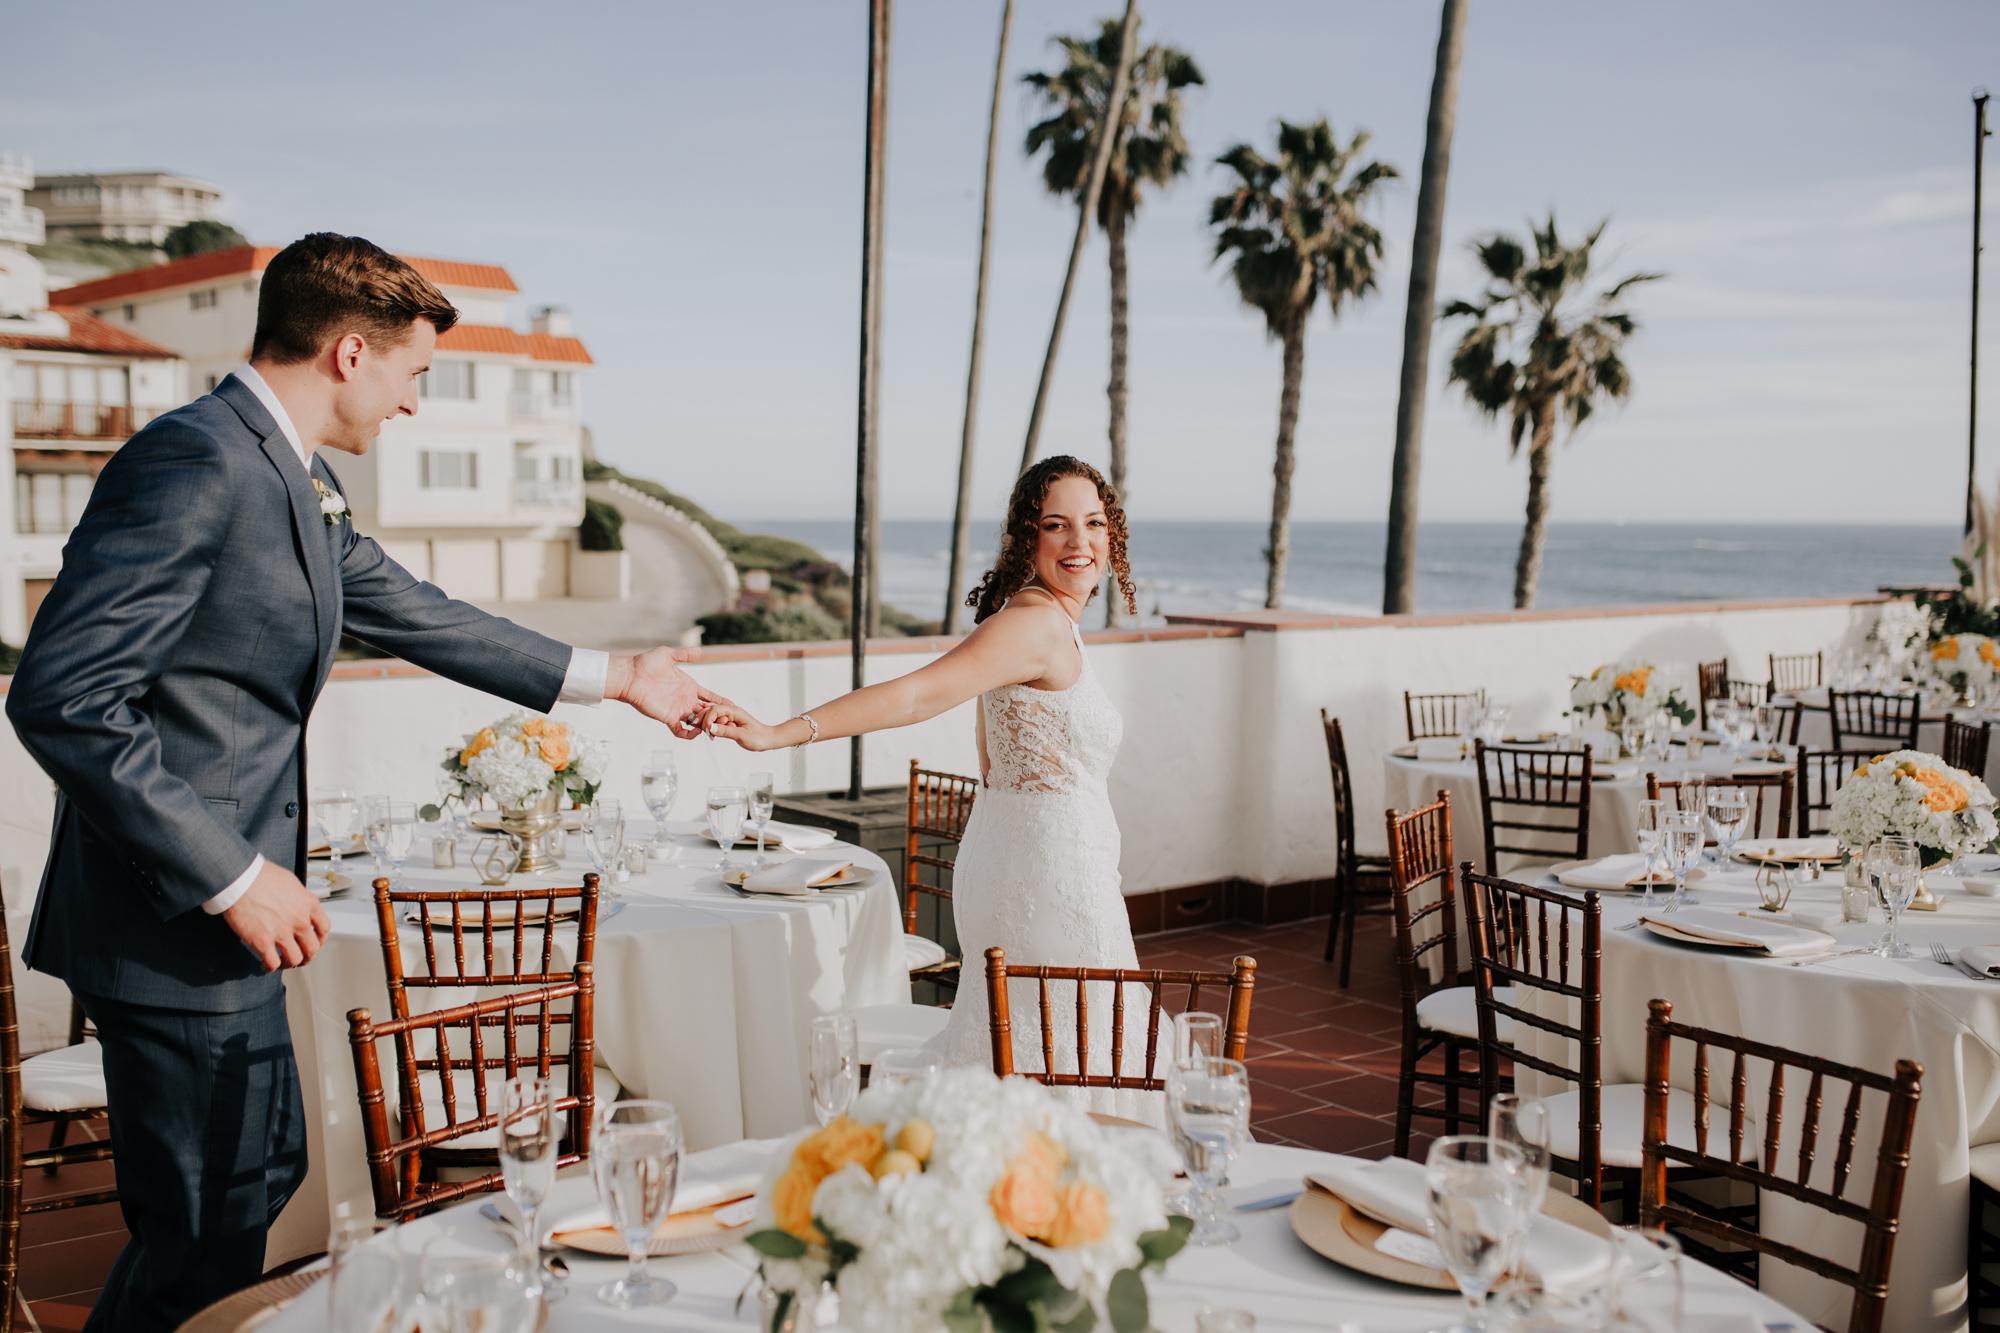 113-destination-wedding-san-clemente-california.jpg